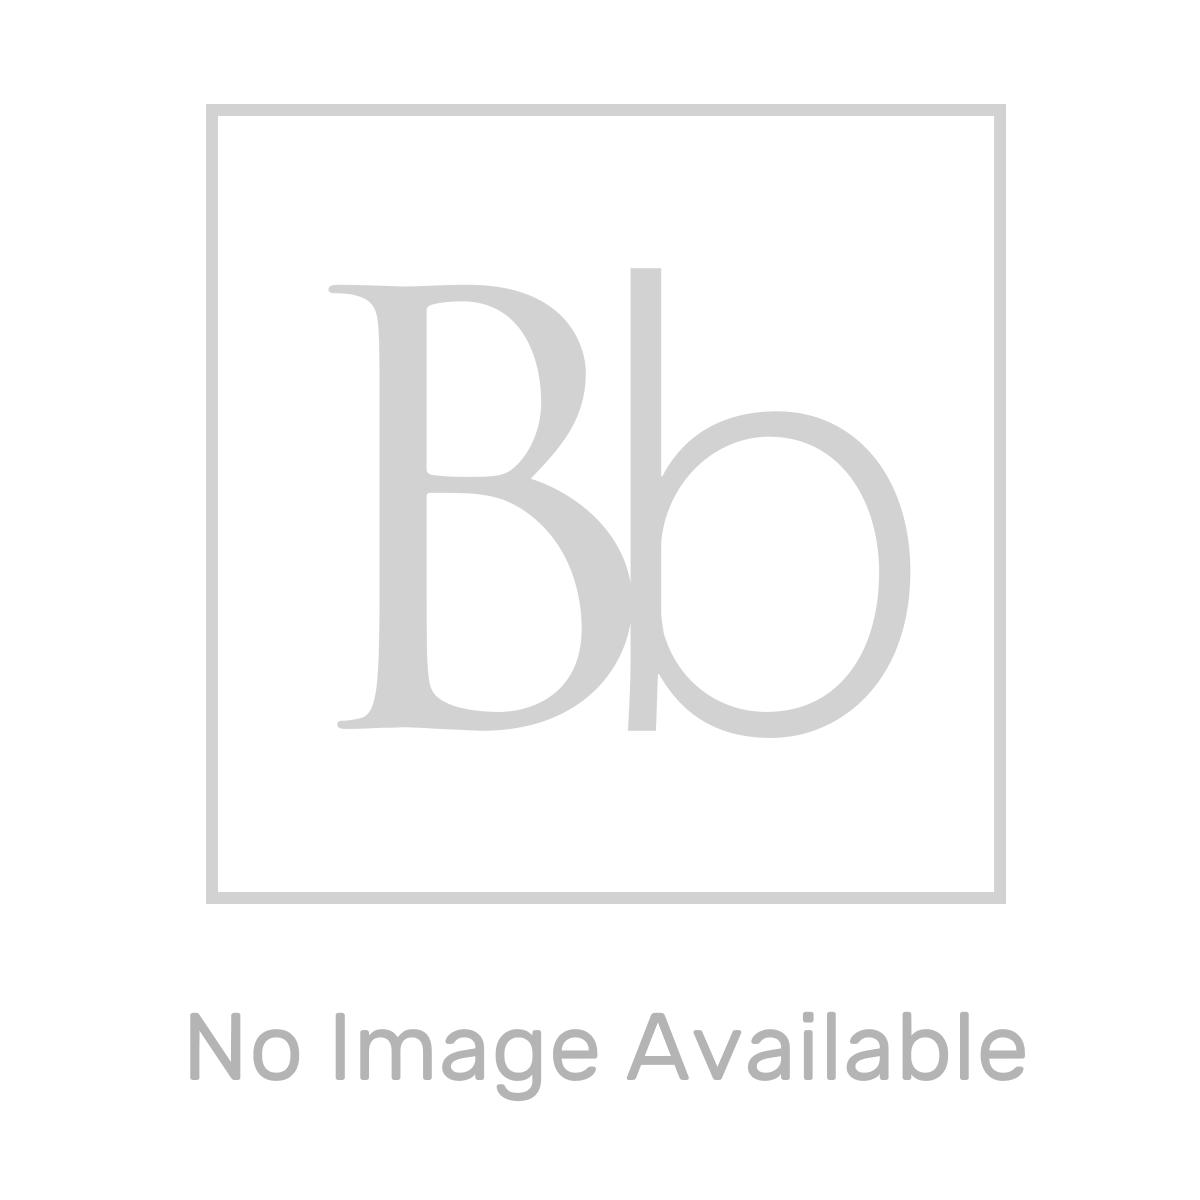 Kartell K-vit White Tetris L Shaped Left Hand Bath Only with Leg Sets 1500mm